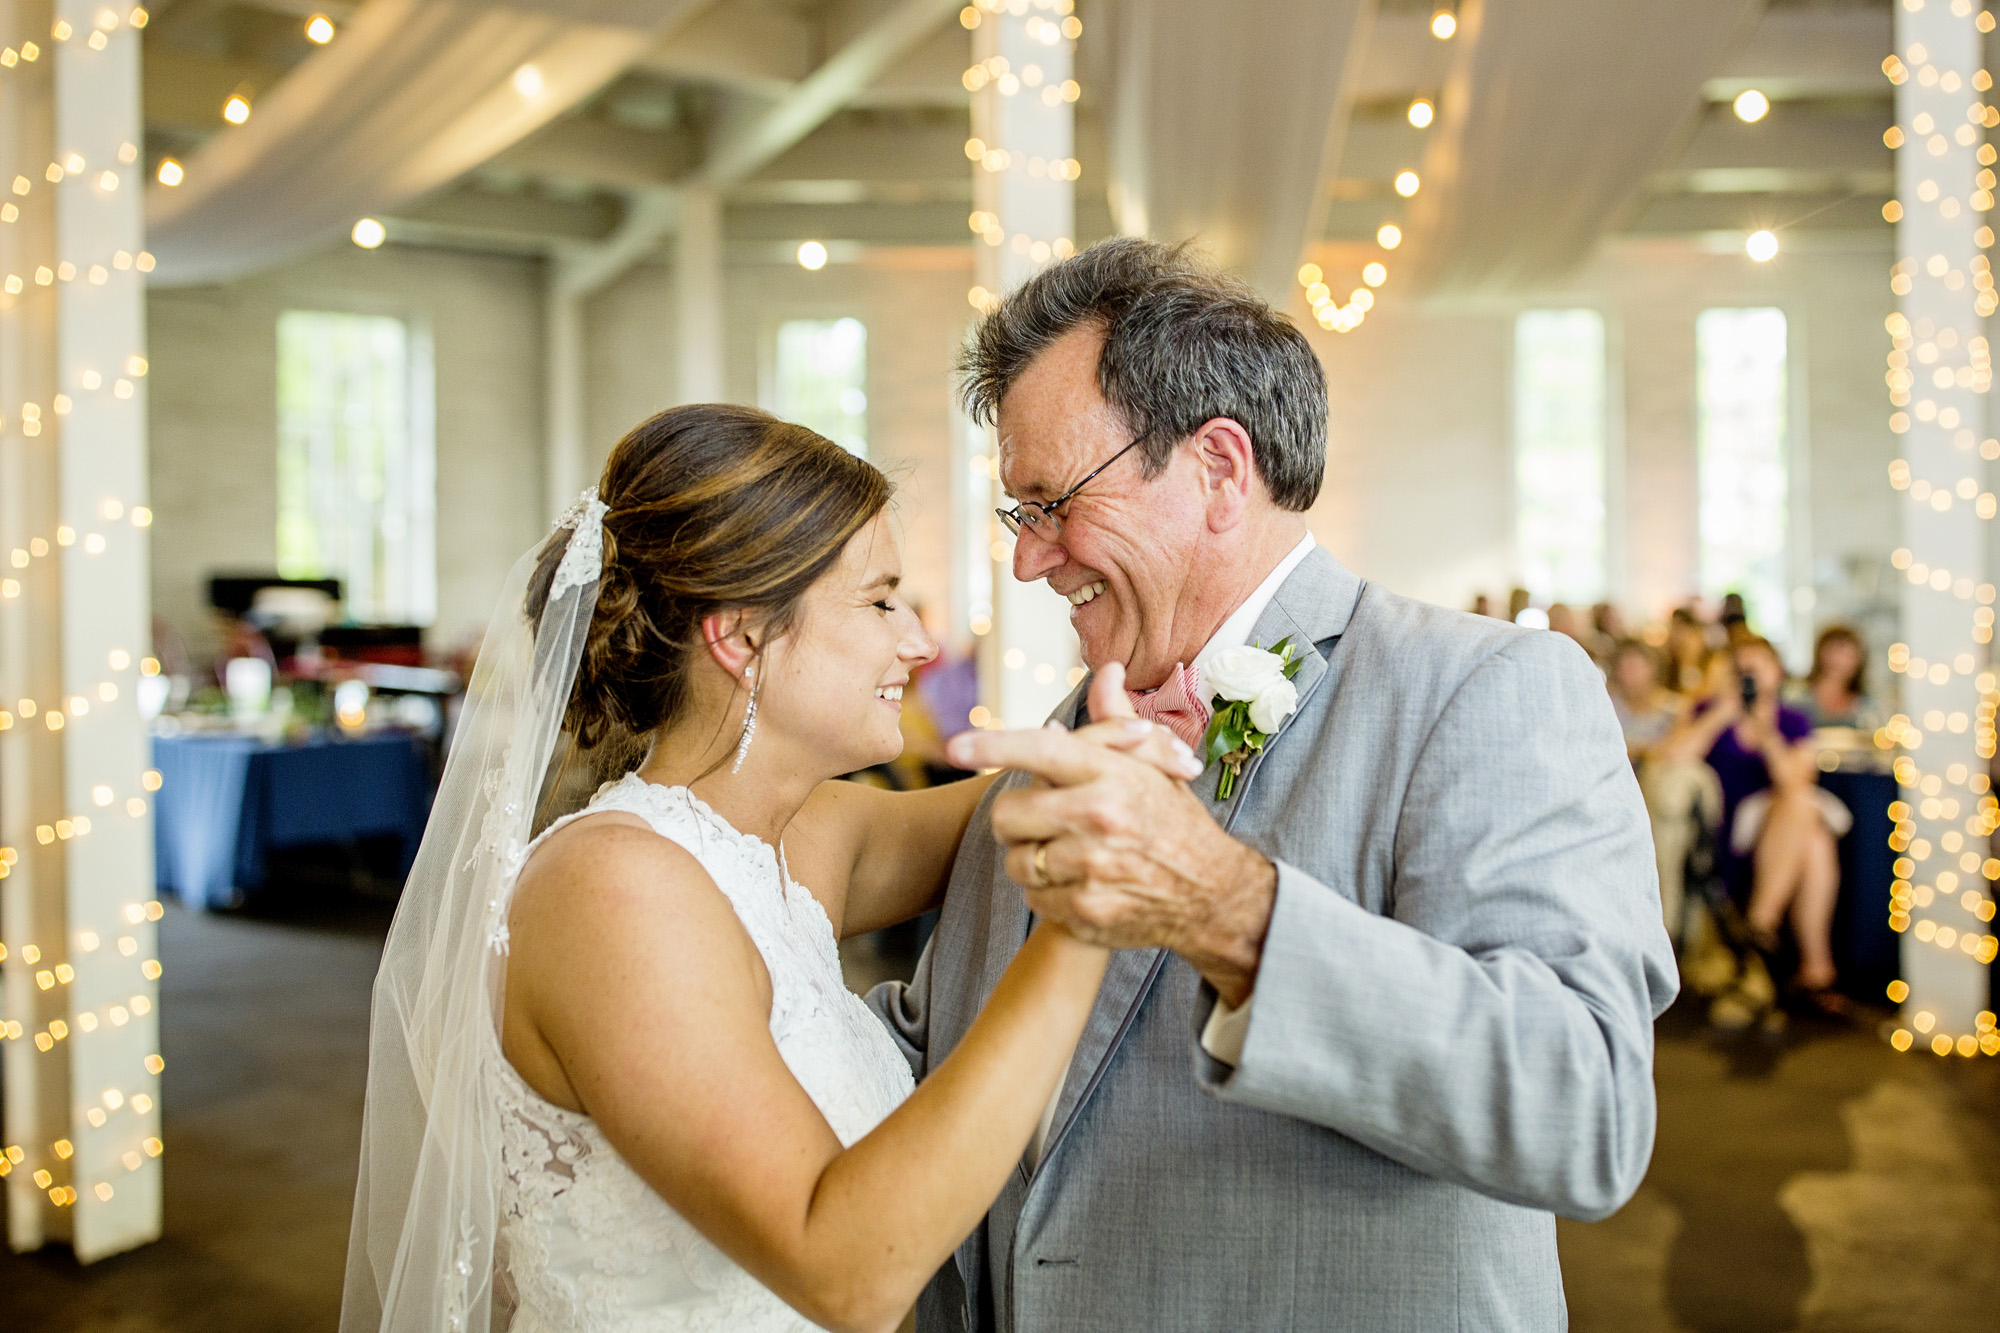 Seriously_Sabrina_Photography_Lexington_Kentucky_Round_Barn_Red_Mile_Stable_of_Memories_Wedding_Hart_102.jpg